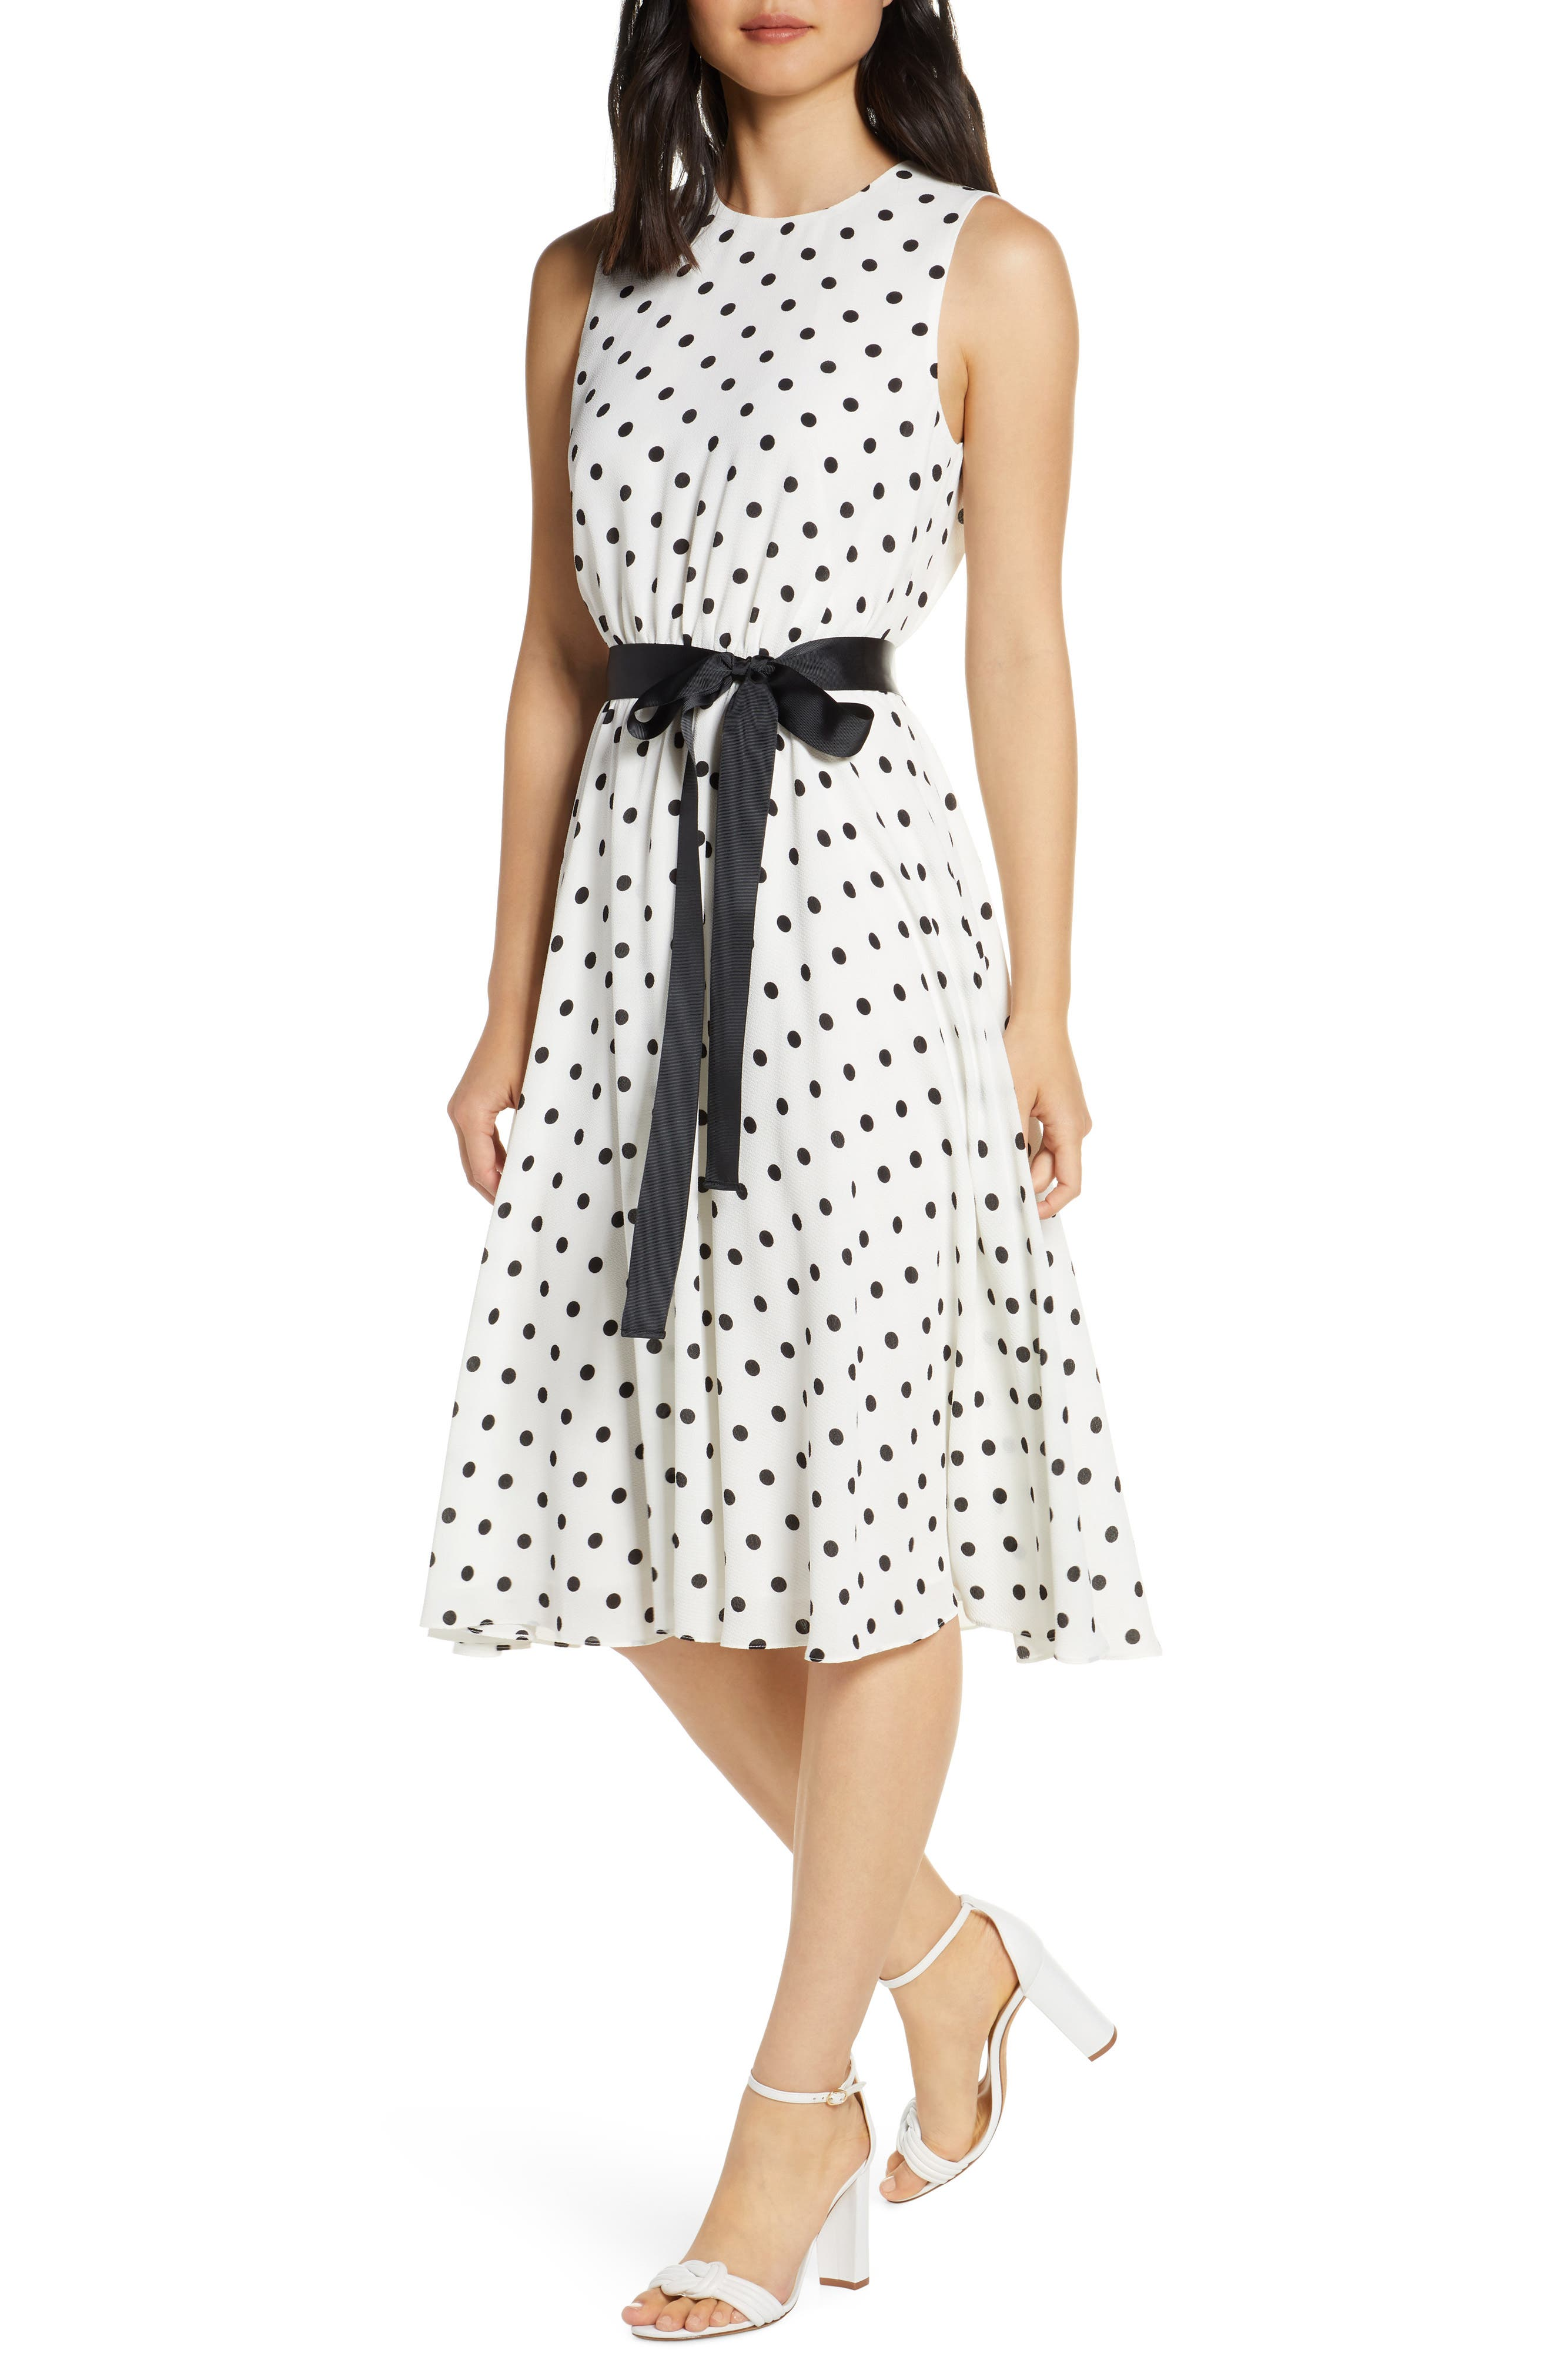 Petite Harper Rose Polka Dot Fit & Flare Dress, Ivory